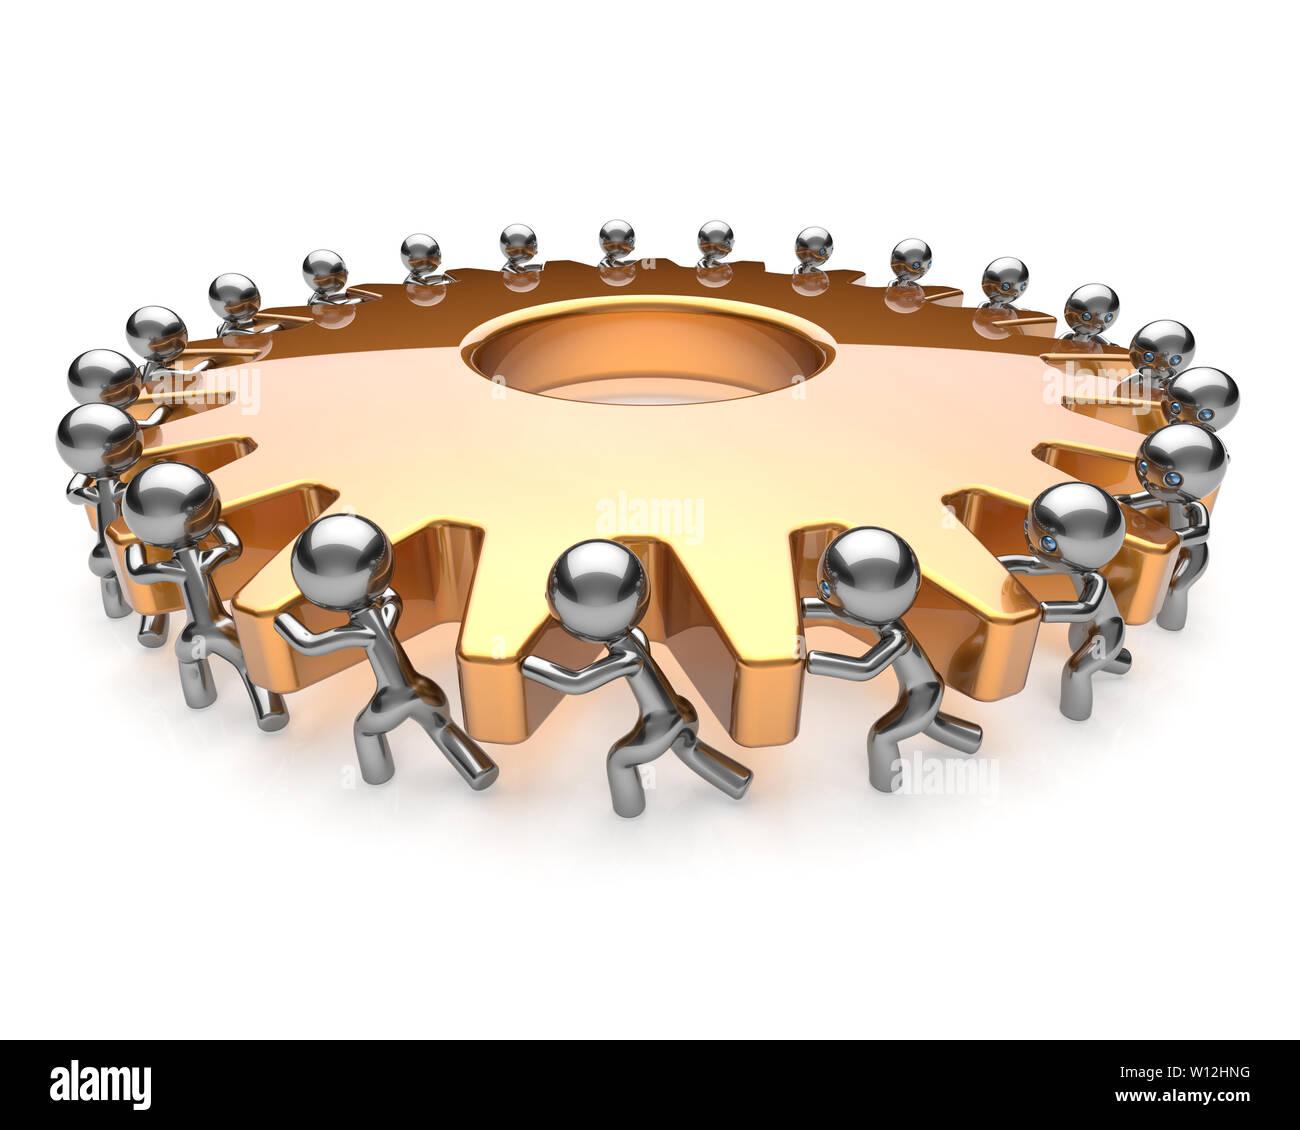 Gearwheel partnership teamwork team work hard job business men turning gear wheel together. Brainstorming cooperation assistance activism community co - Stock Image